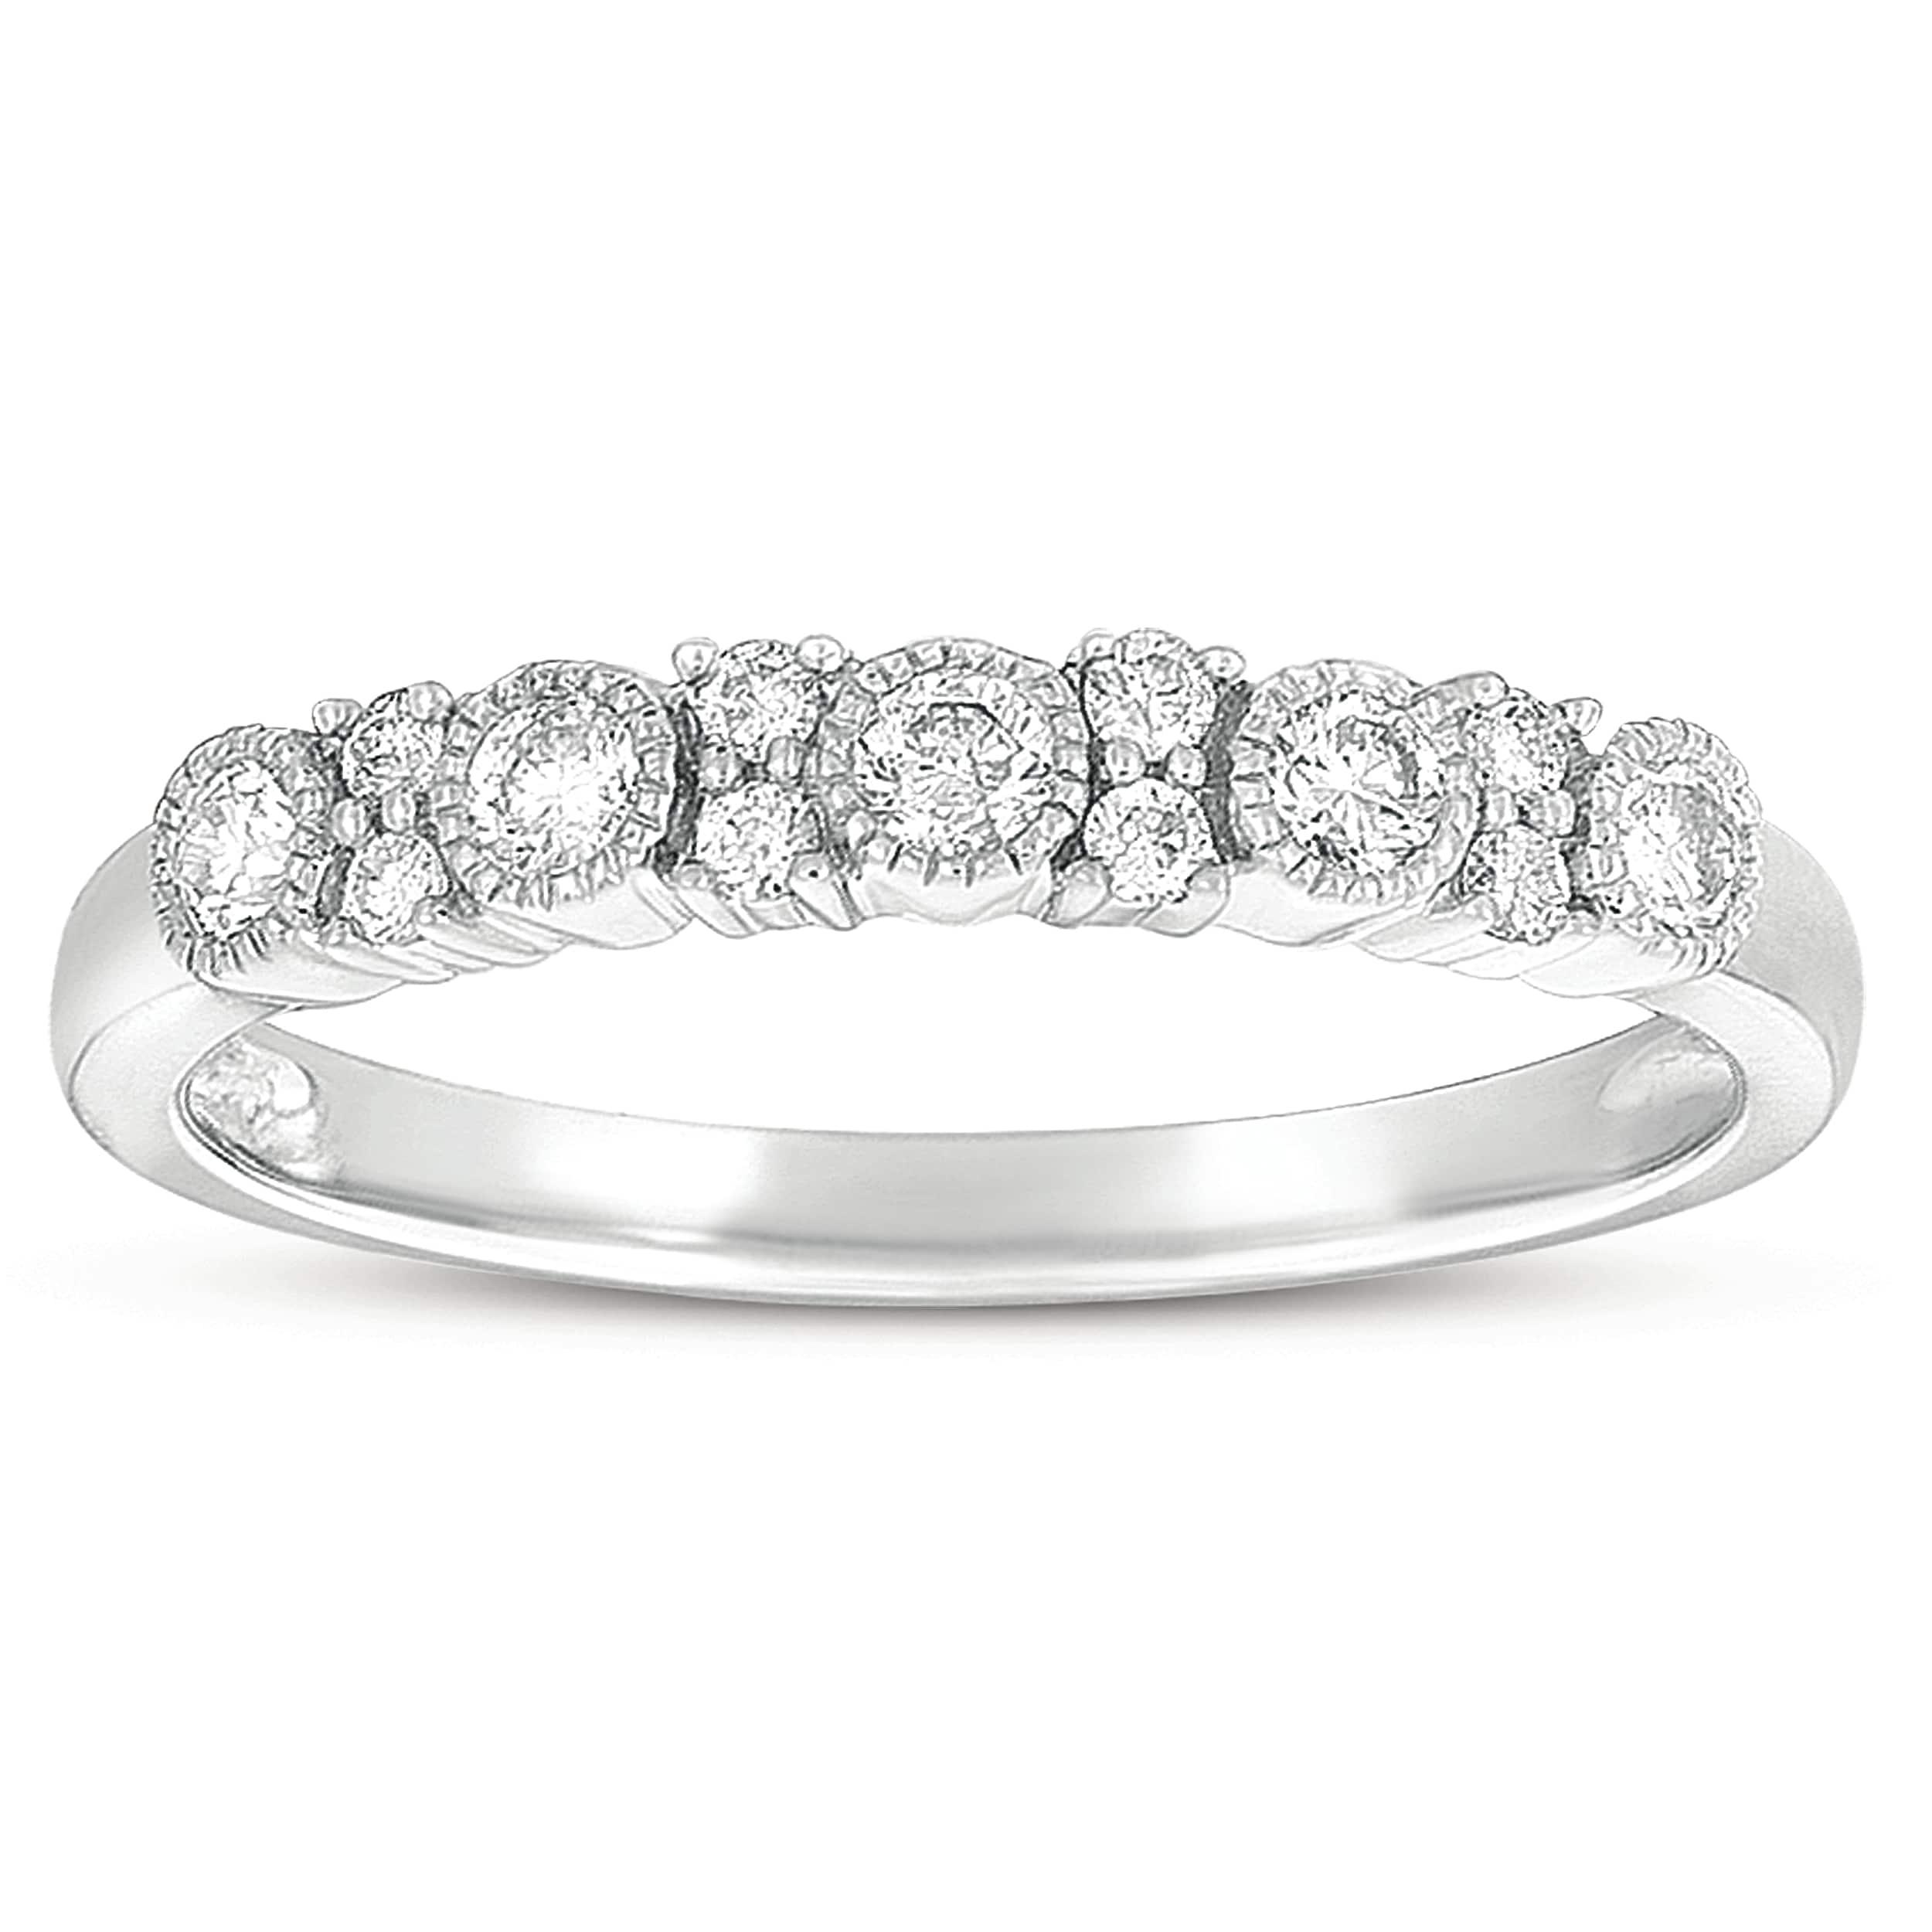 Eloquence 10k White Gold 3/8ct TDW Diamond Ring (G-I, I1-I2)